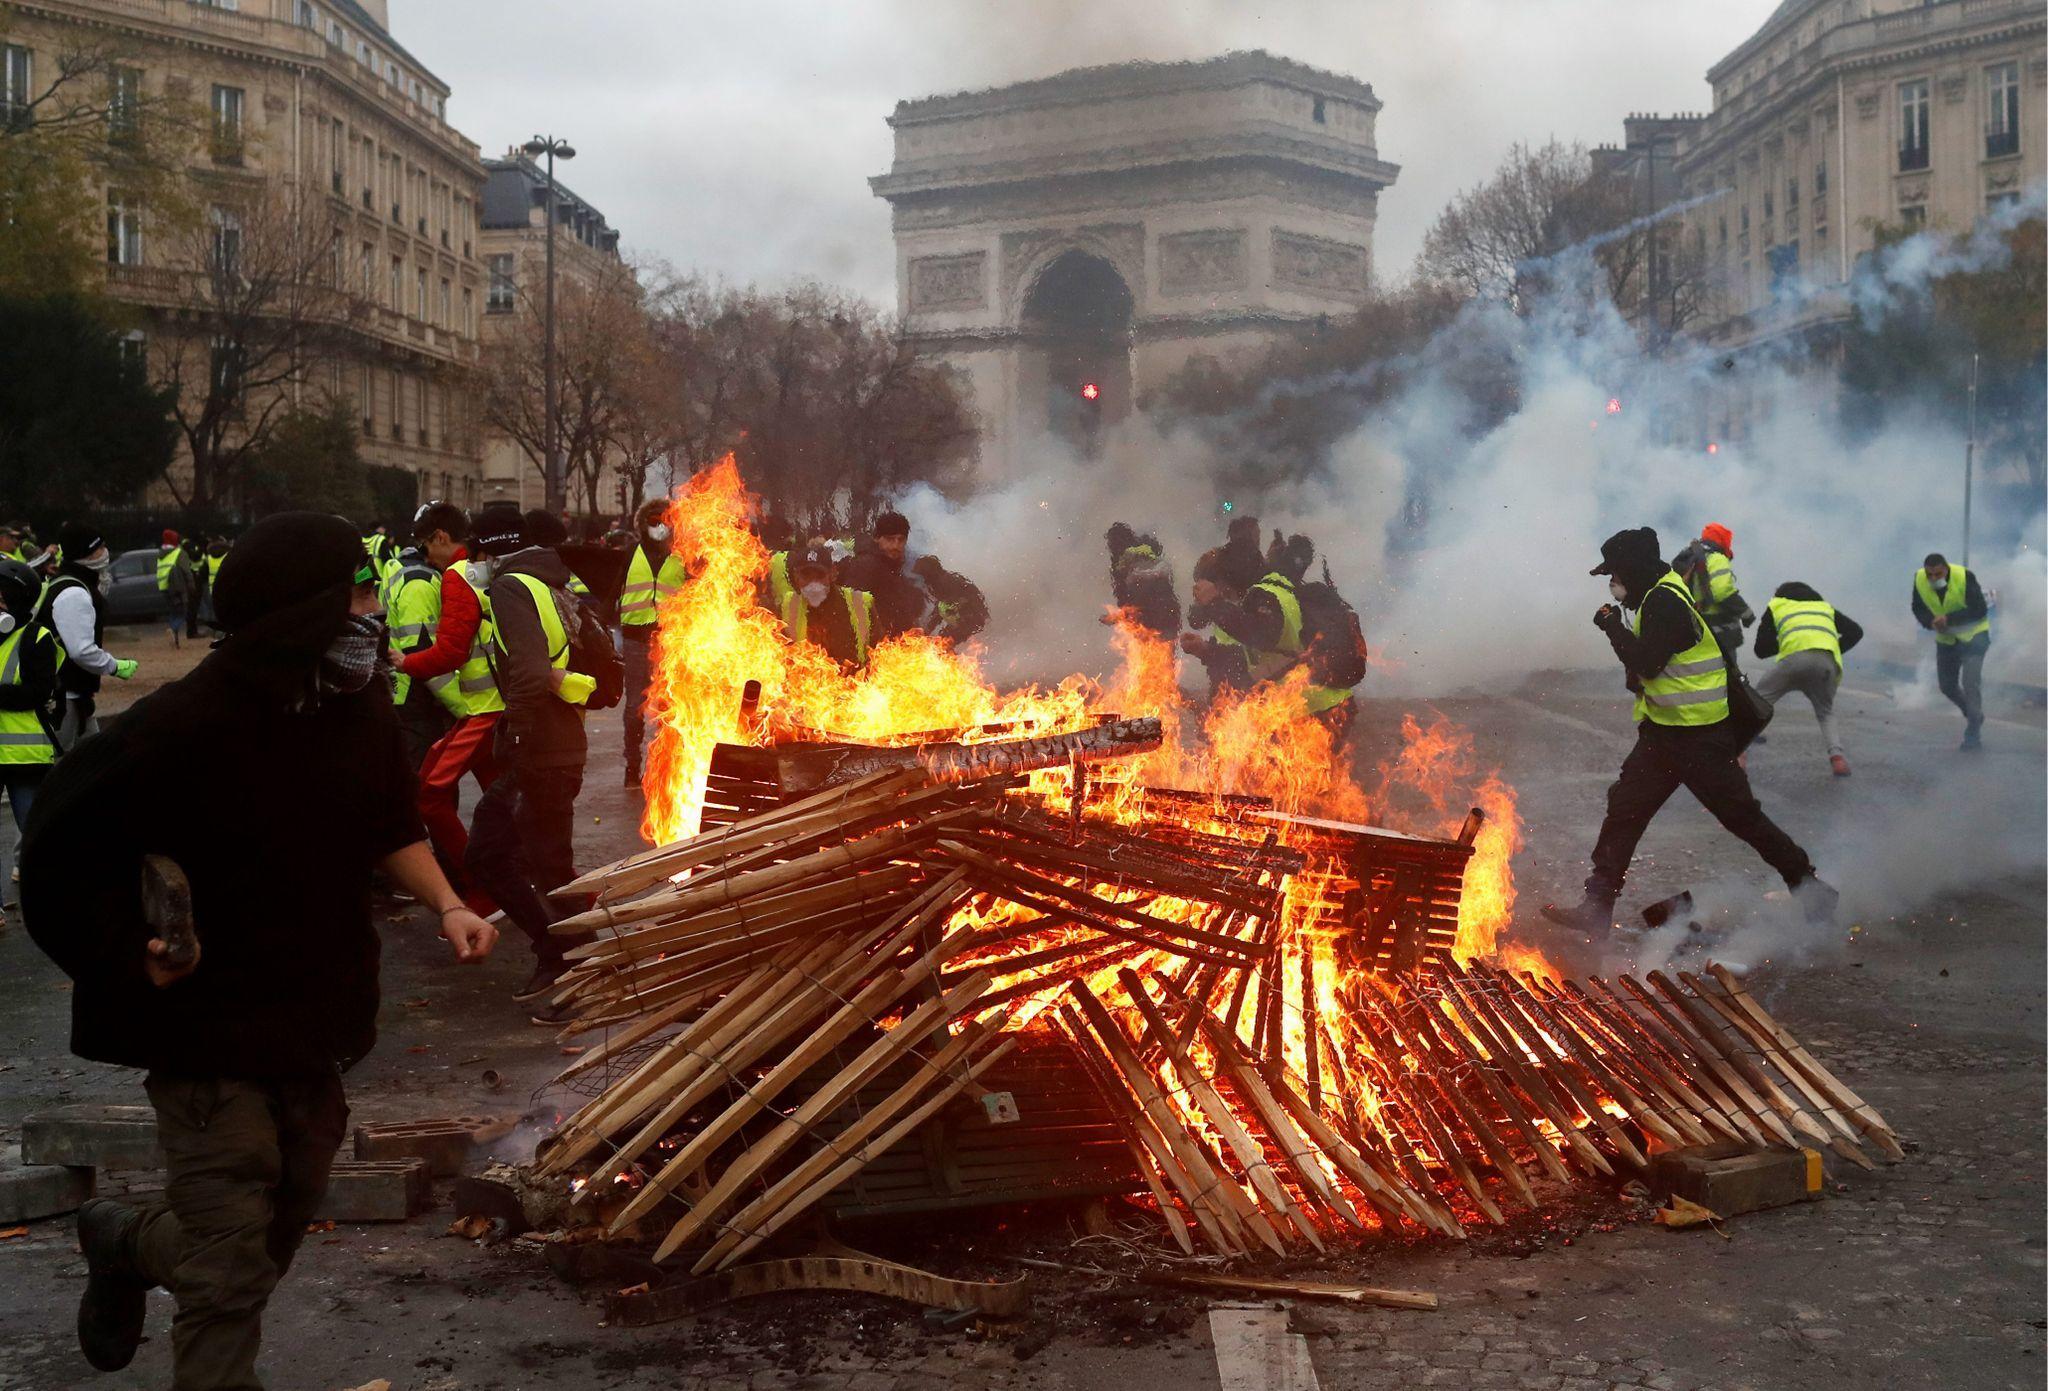 Yellow Jackets France Protest Threatens Macron Paris Protests Paris France